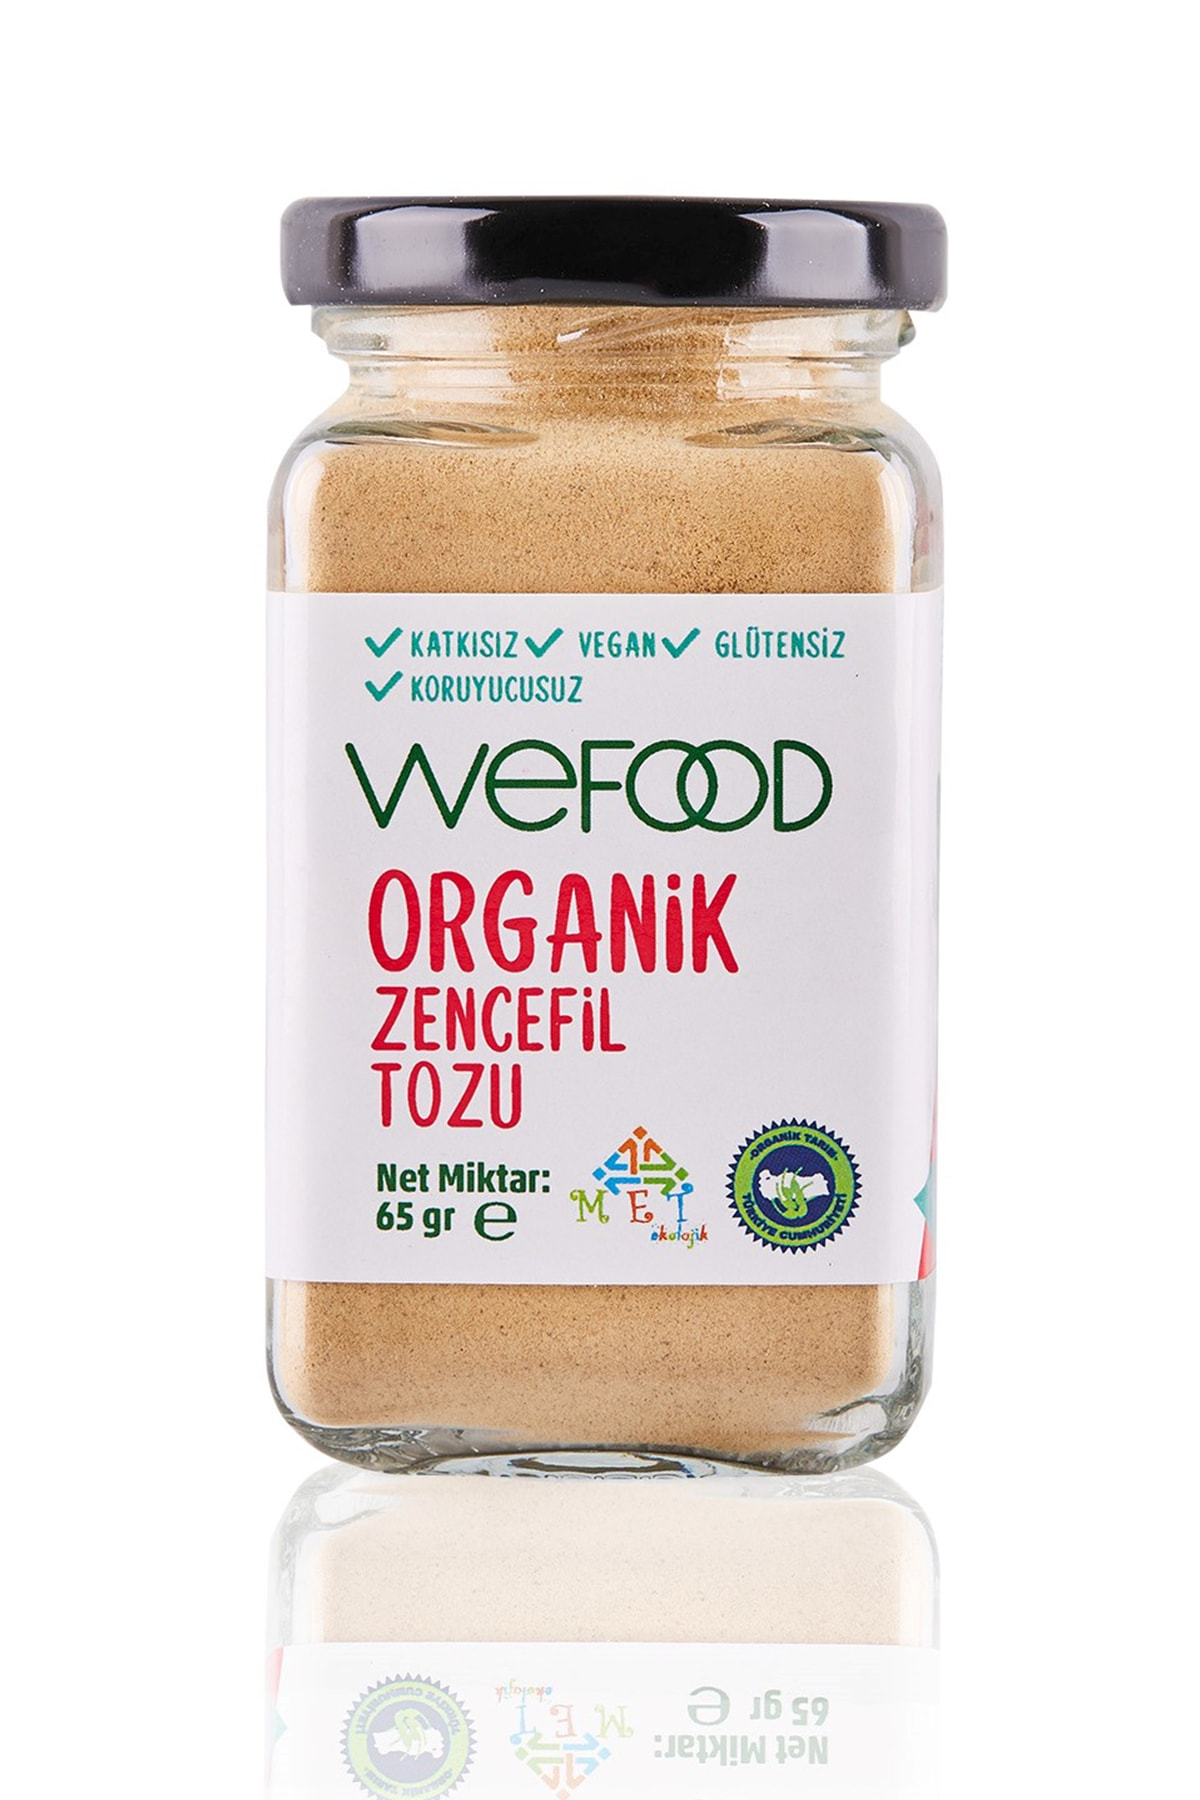 Wefood Organik Zencefil Tozu 65 gr 1